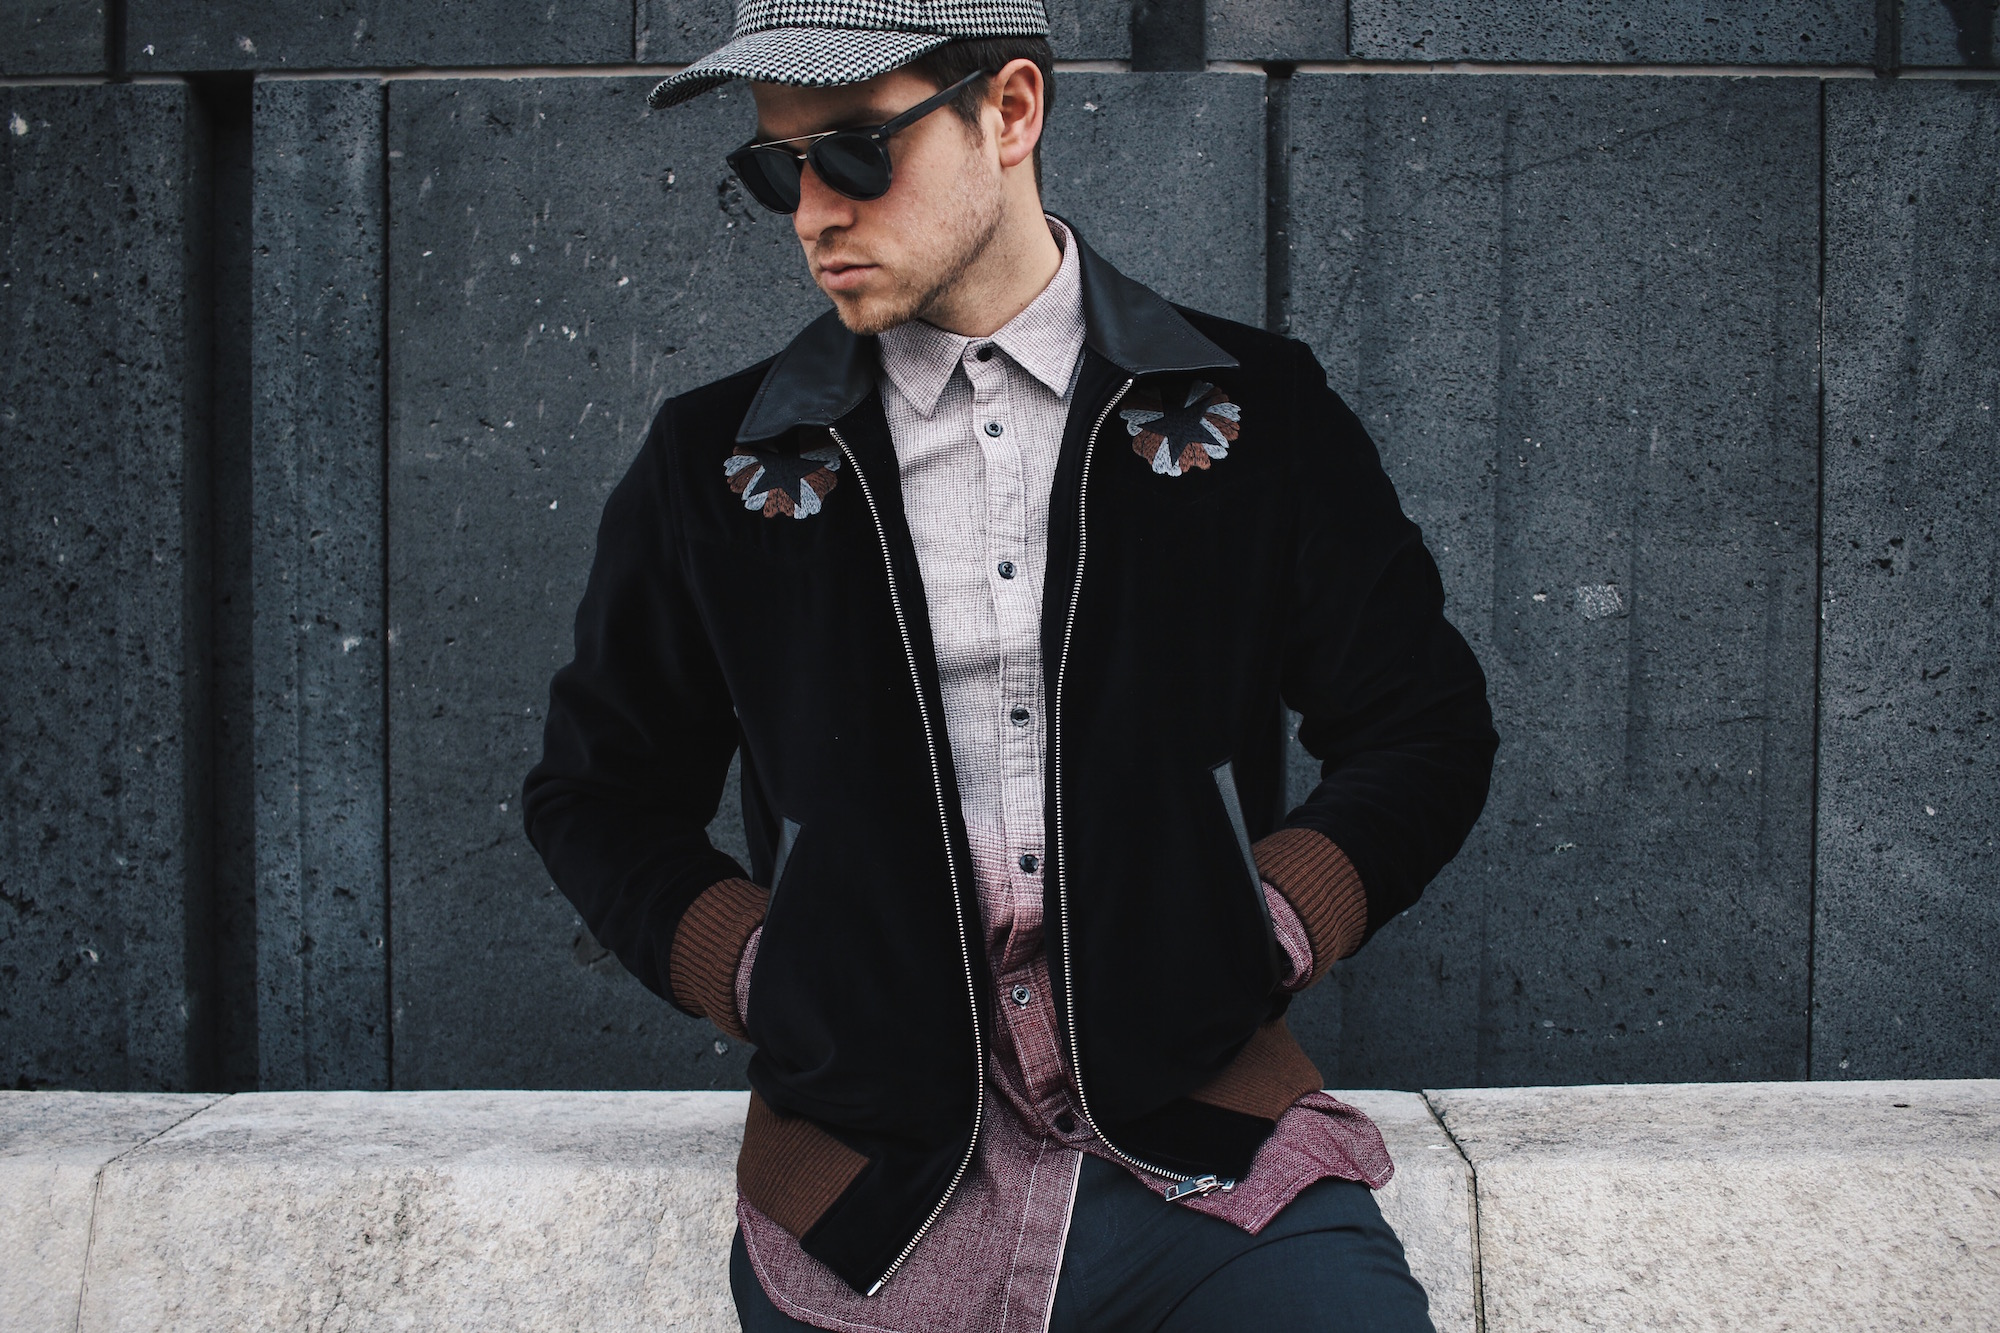 Diesel Pre-Spring 2017 Kollektion _ Meine Lieblingslooks für Herren _ Meanwhile in Awesometown_ Wiener Modeblogger _ Männerblog _ Lifestyleblog2